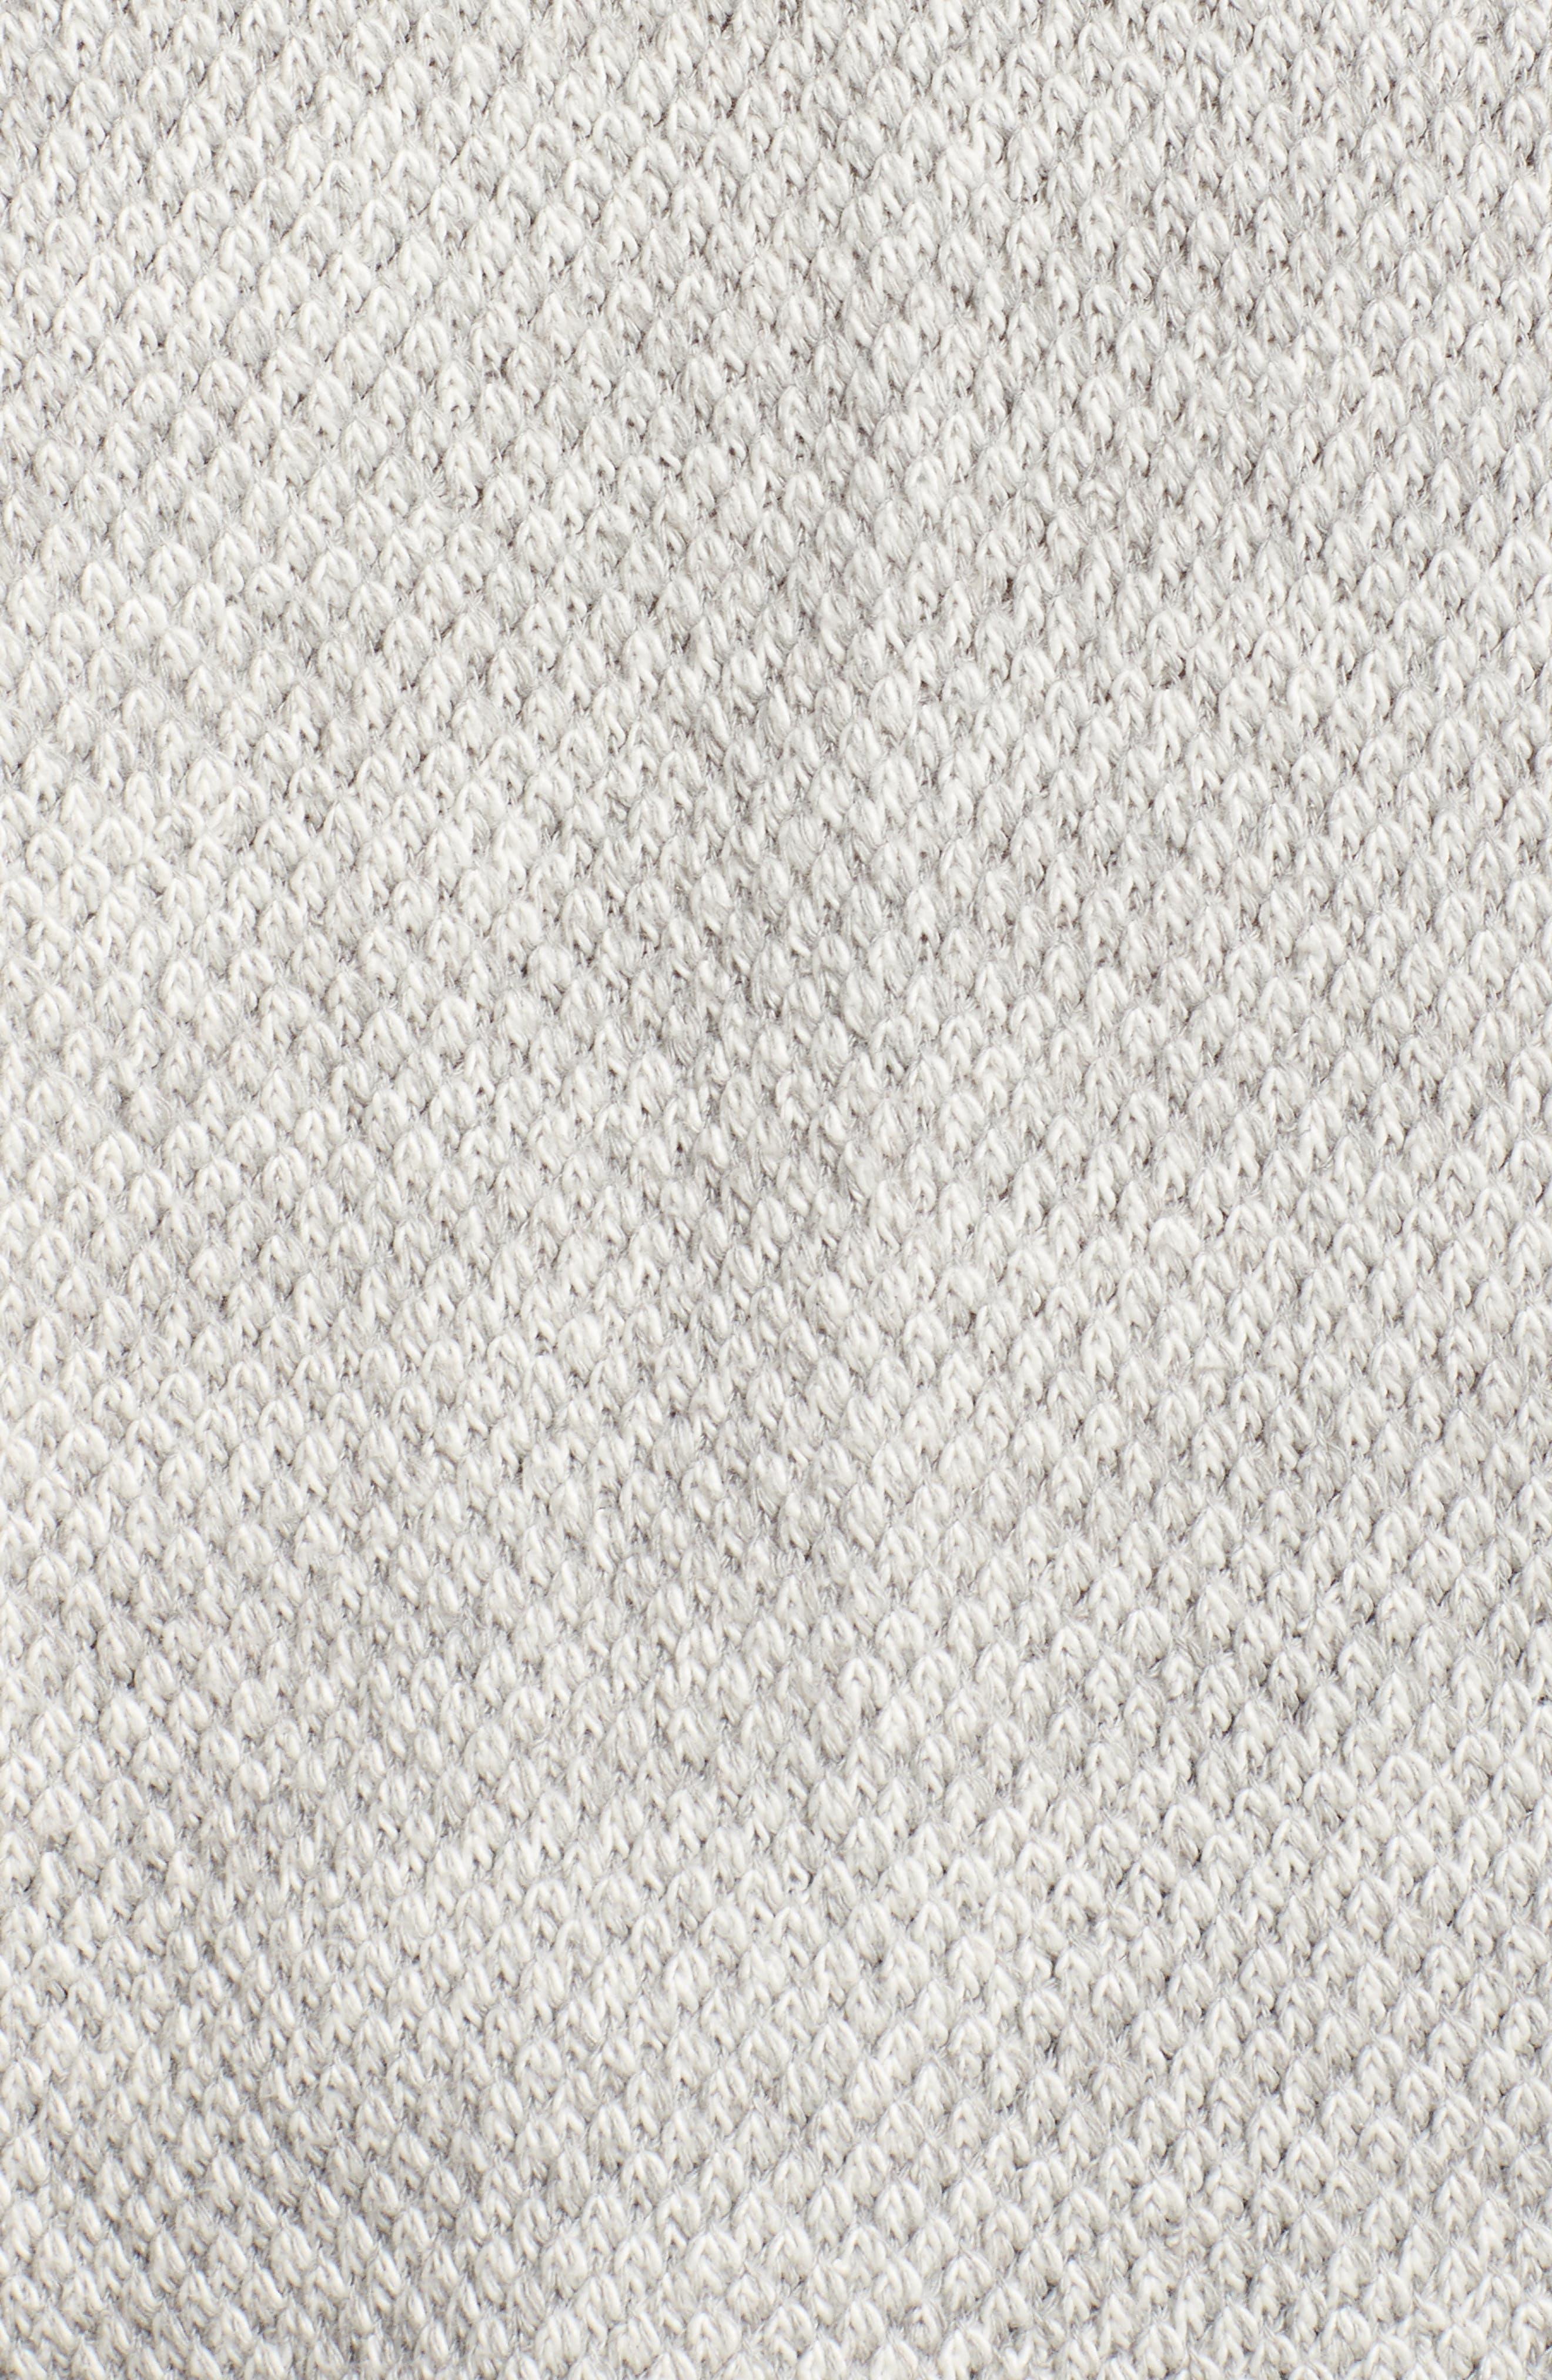 Oversize Turtleneck Sweater,                             Alternate thumbnail 5, color,                             Heather Grey